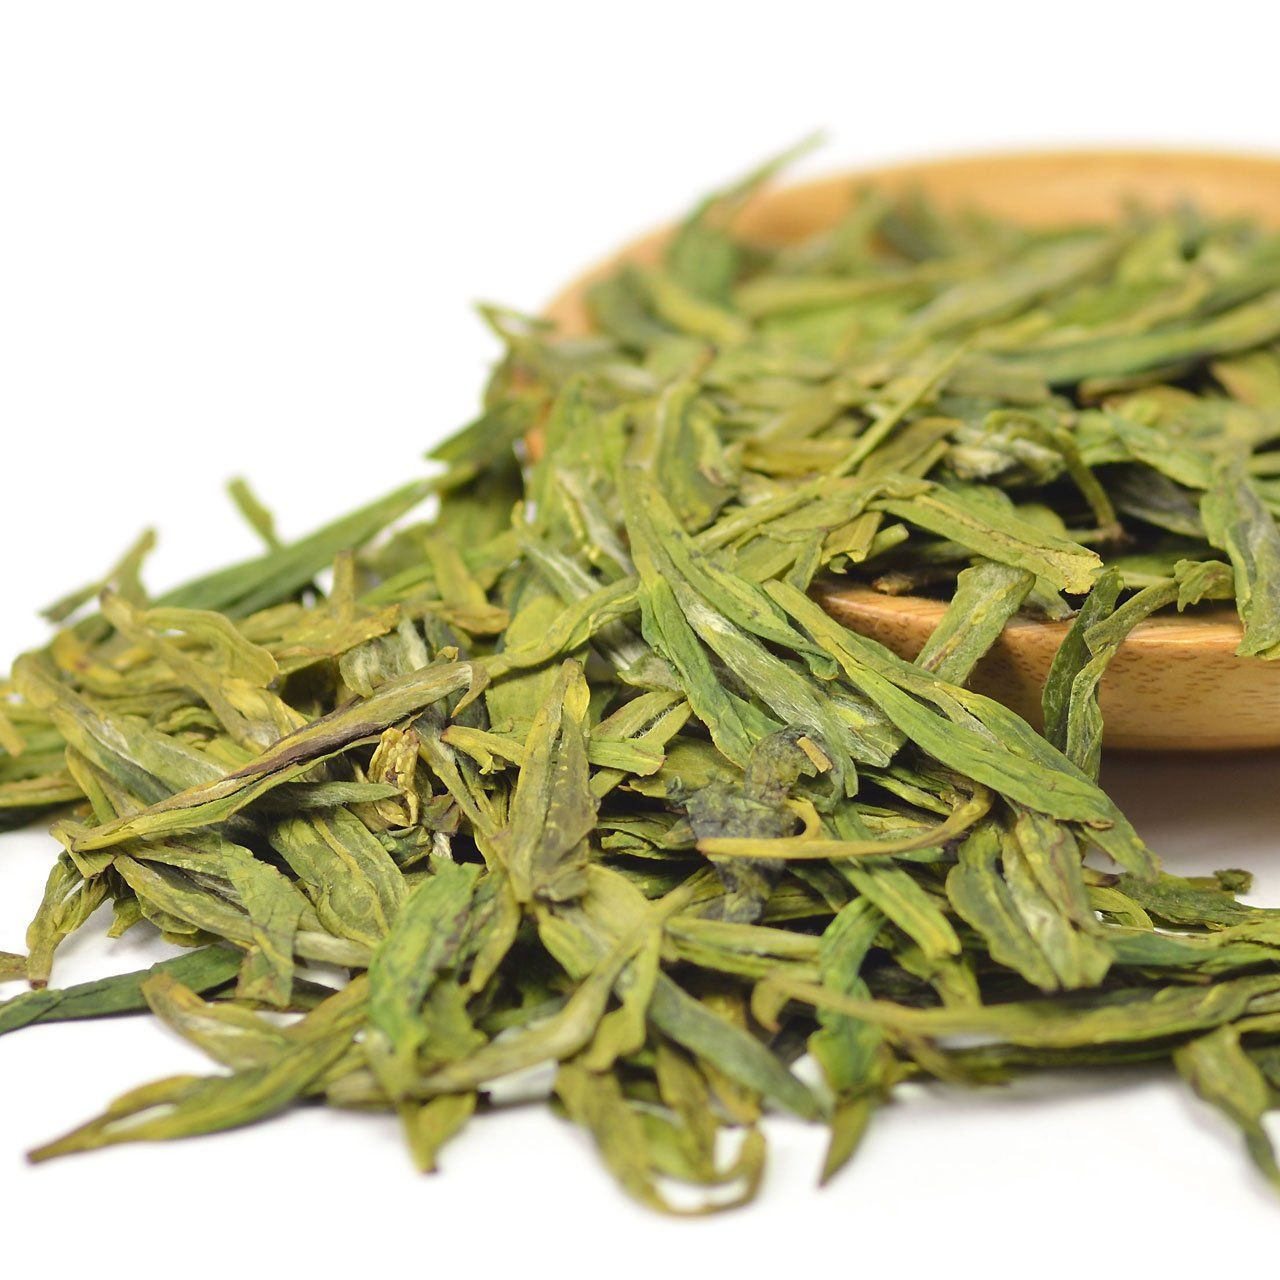 Teavivre Organic Superfine Dragon Well Long Jing Green Tea